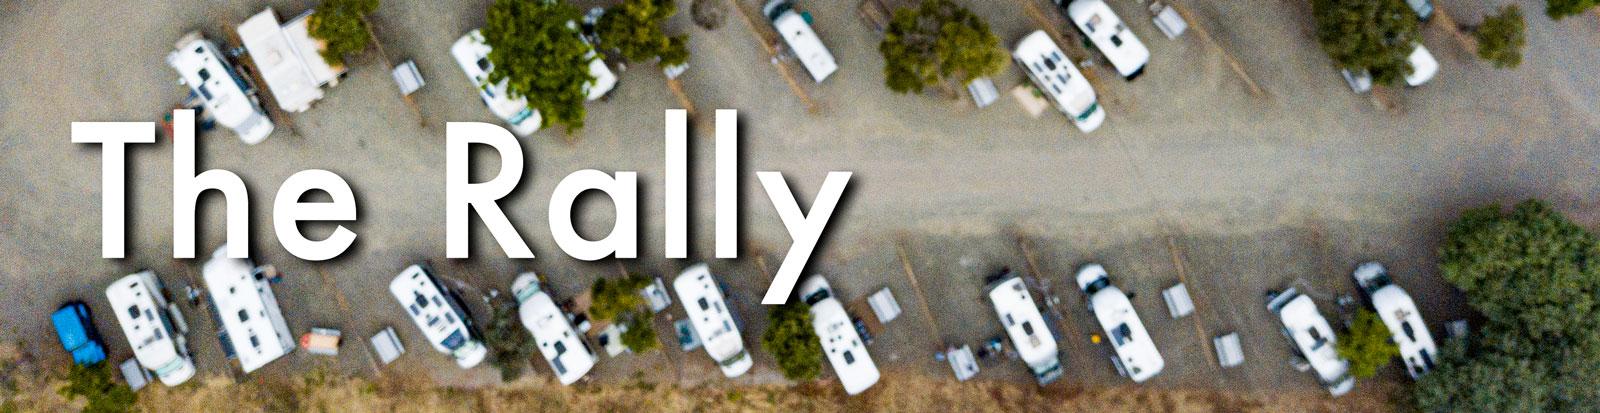 rally-header.jpg